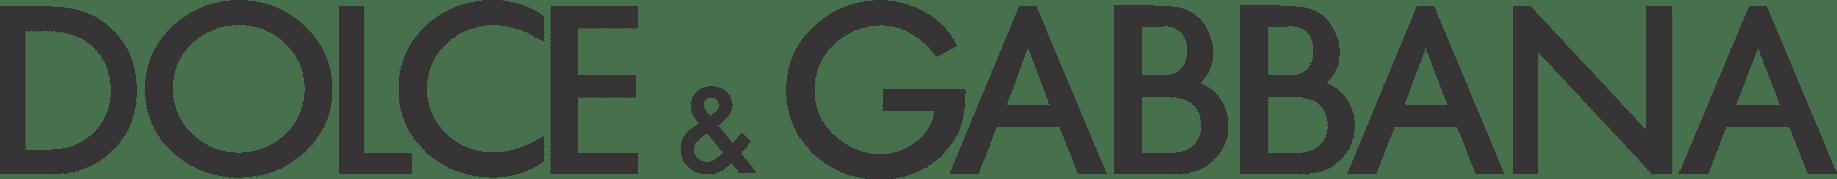 https://ik.imagekit.io/657zfducf/image/data/sunglass-testing/logo/DolceGabbana-logo.png